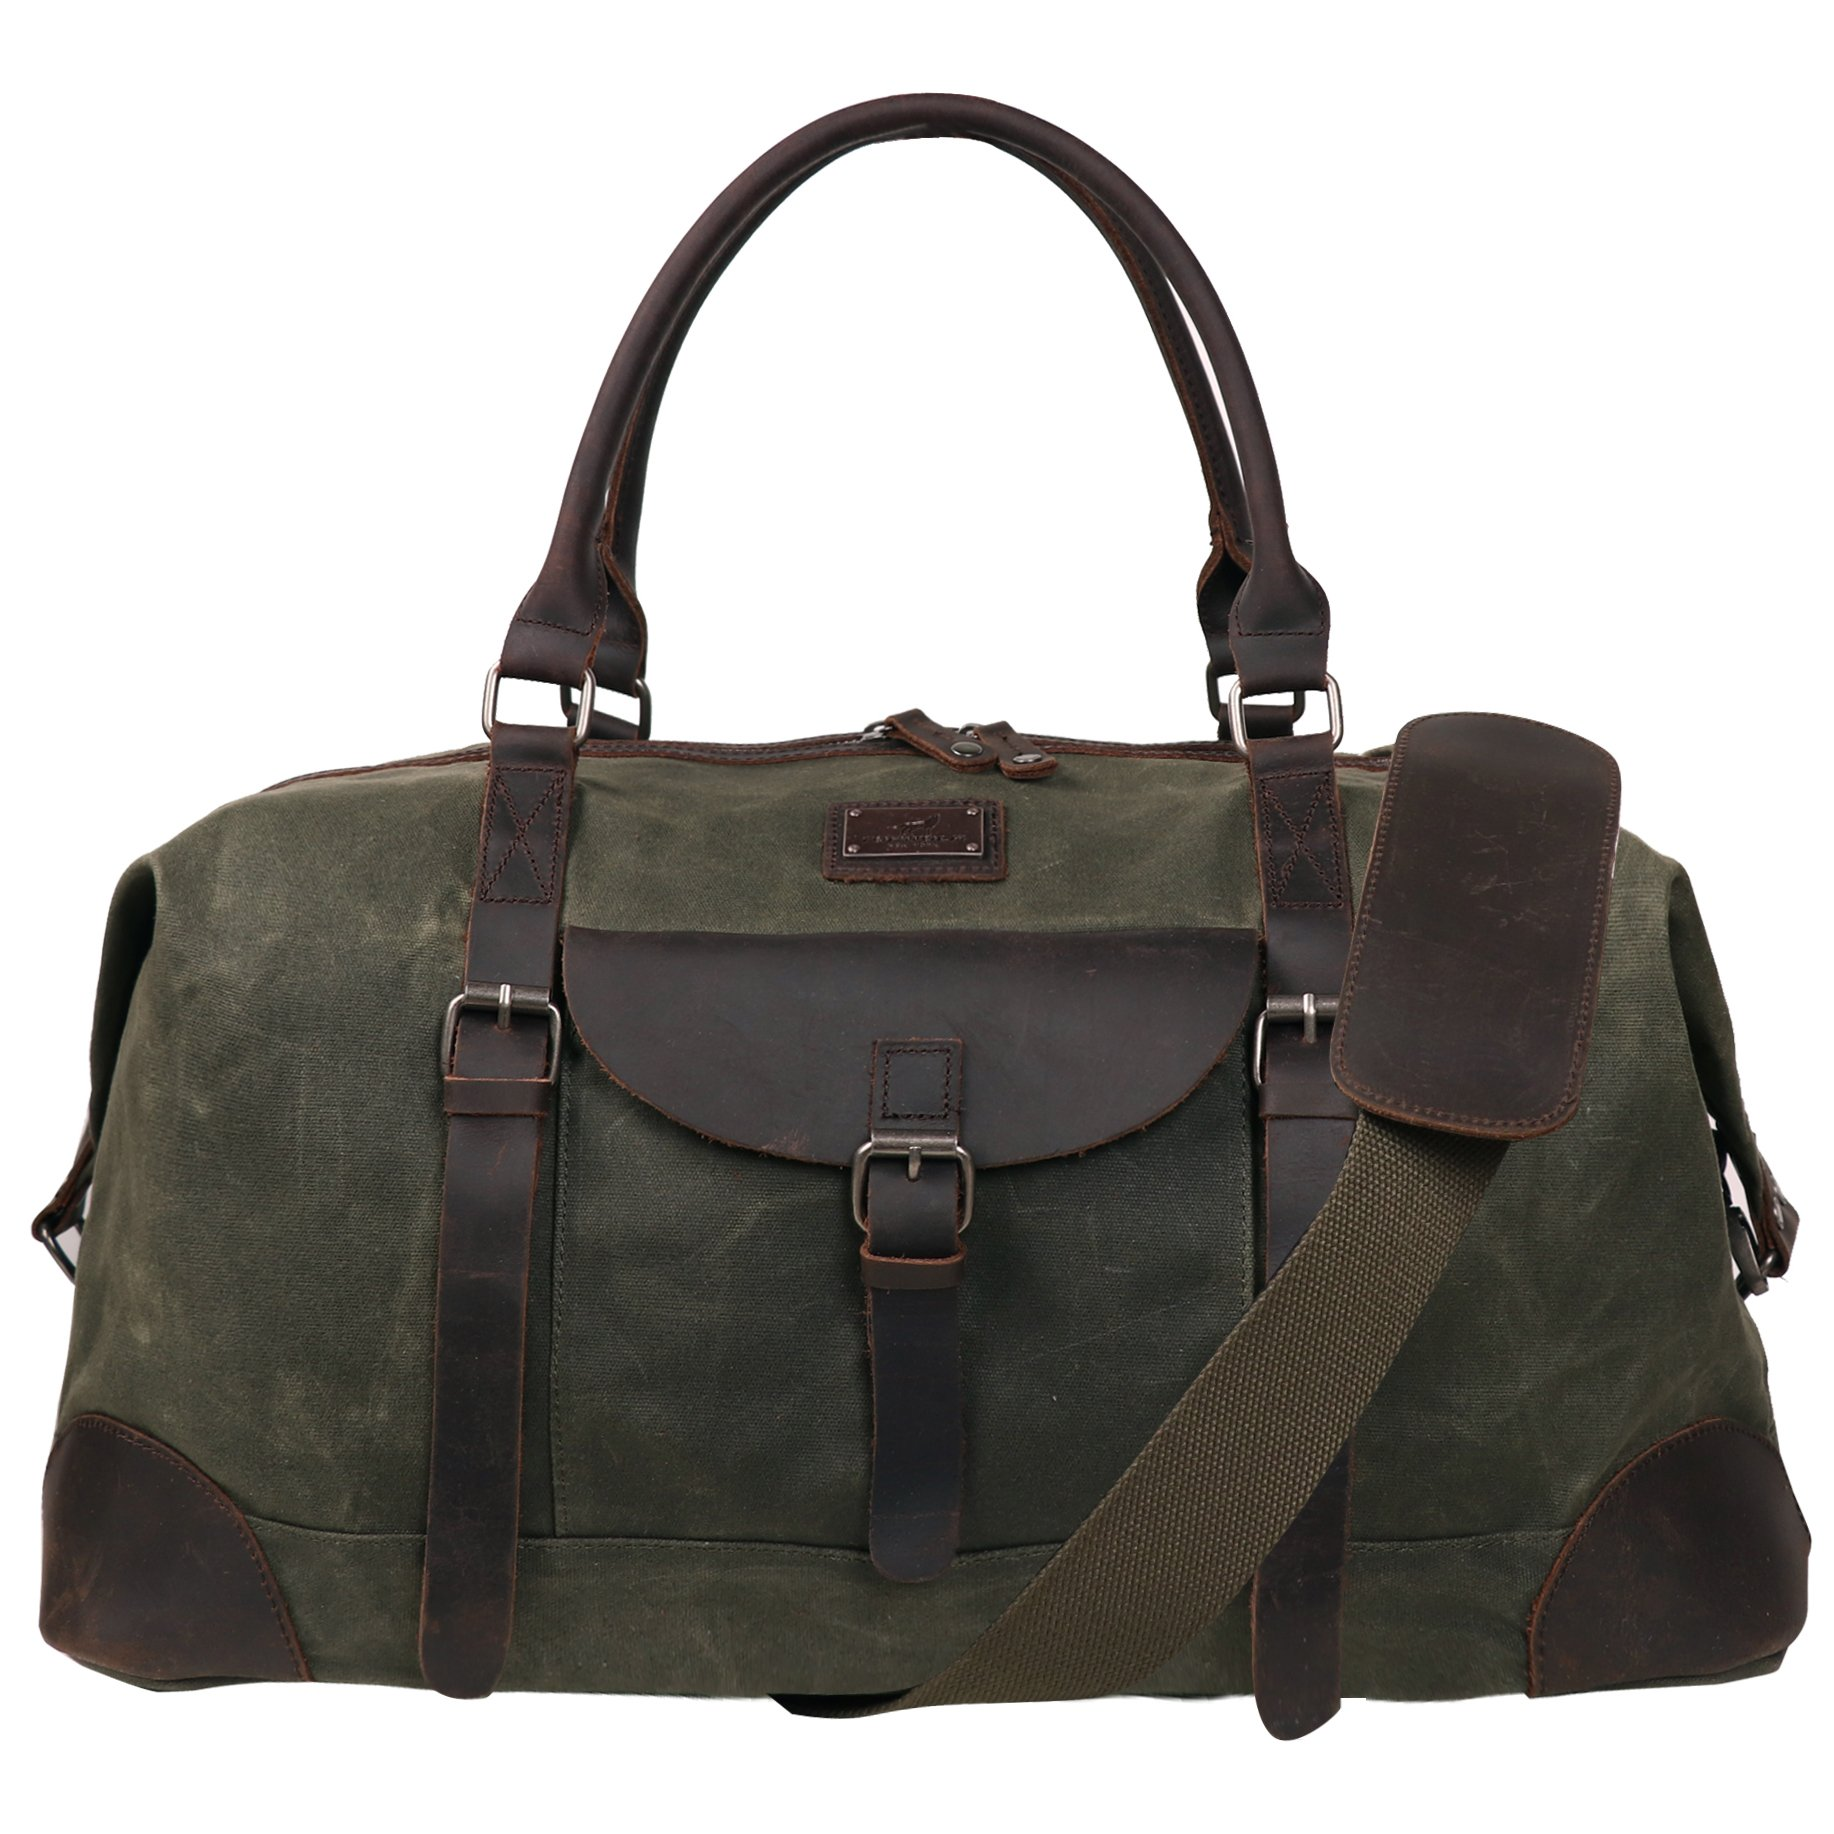 Canvas Duffel Bag TOPWOLFS 22'' Travel Duffle Bag Tote Large Holdall Luggage Carry On Weekender Bag Waterproof Waxed Canvas